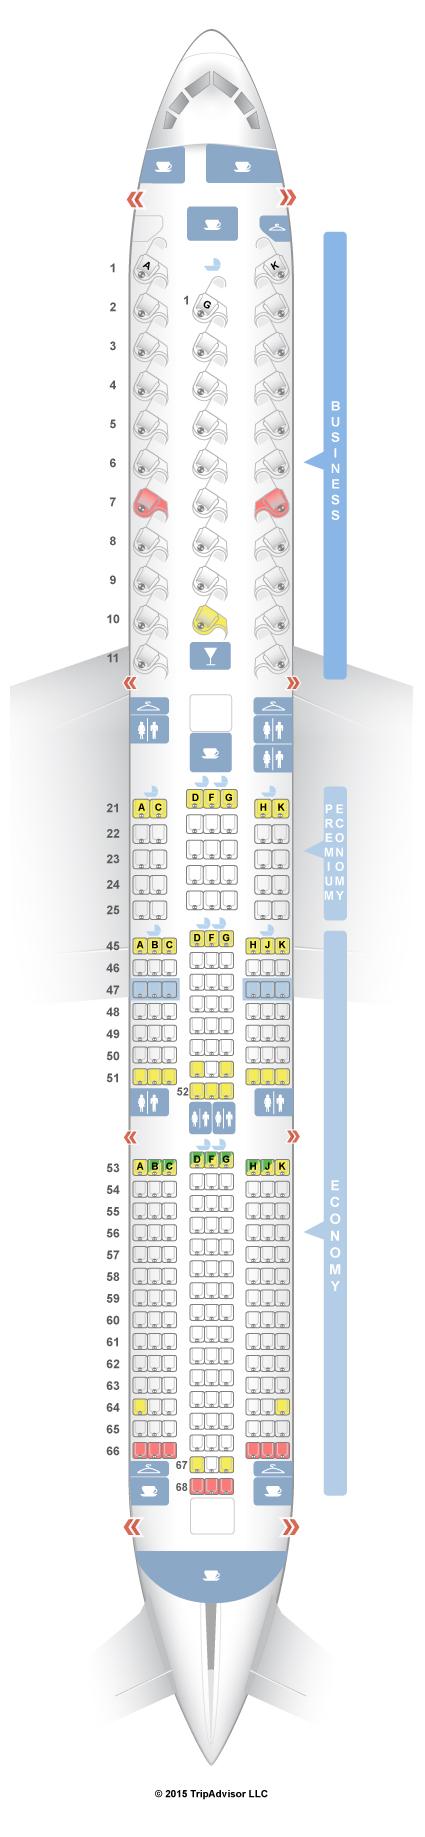 Seatguru Seat Map Virgin Atlantic Boeing 787 900 789